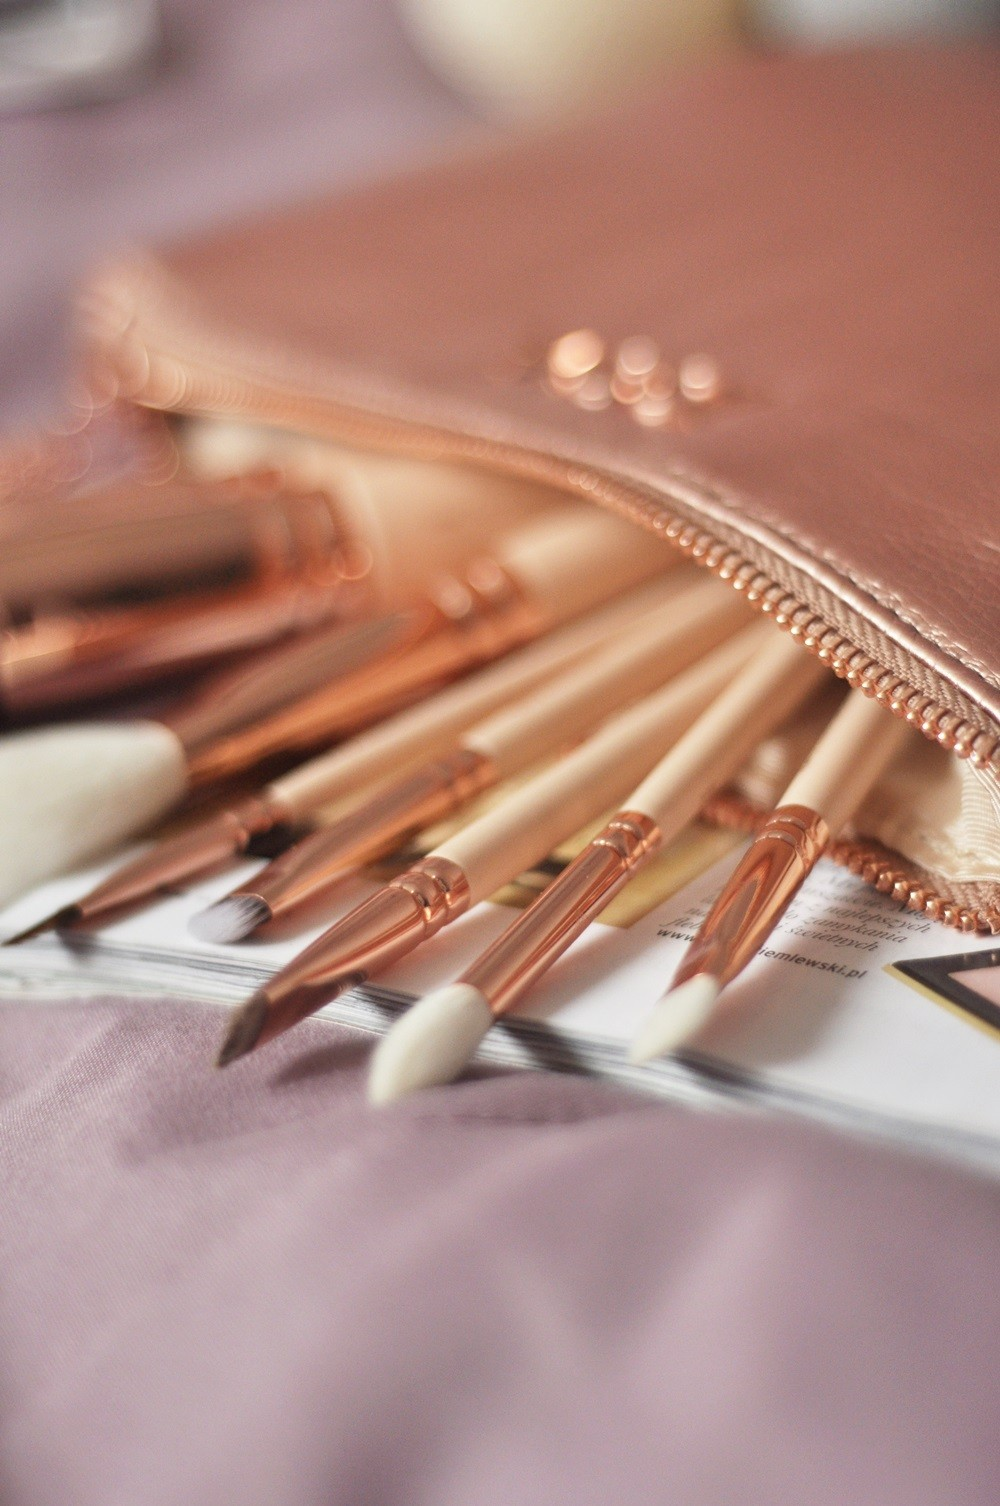 zoeva-rose-golden-brush-mintishop4